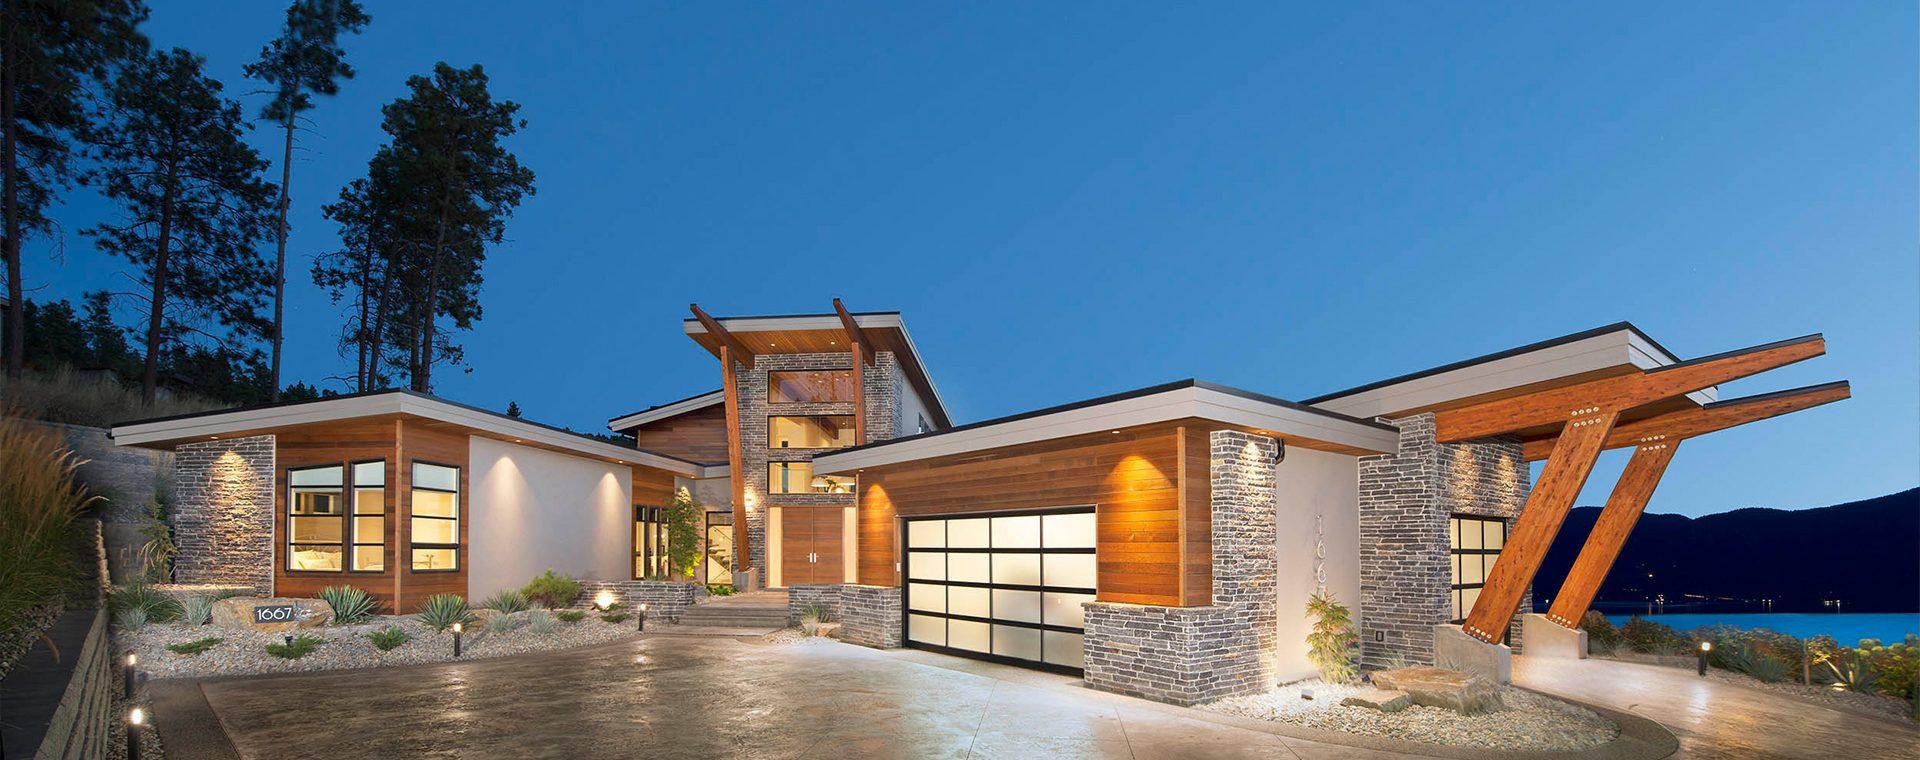 Bellamy Homes: We Design What We Build